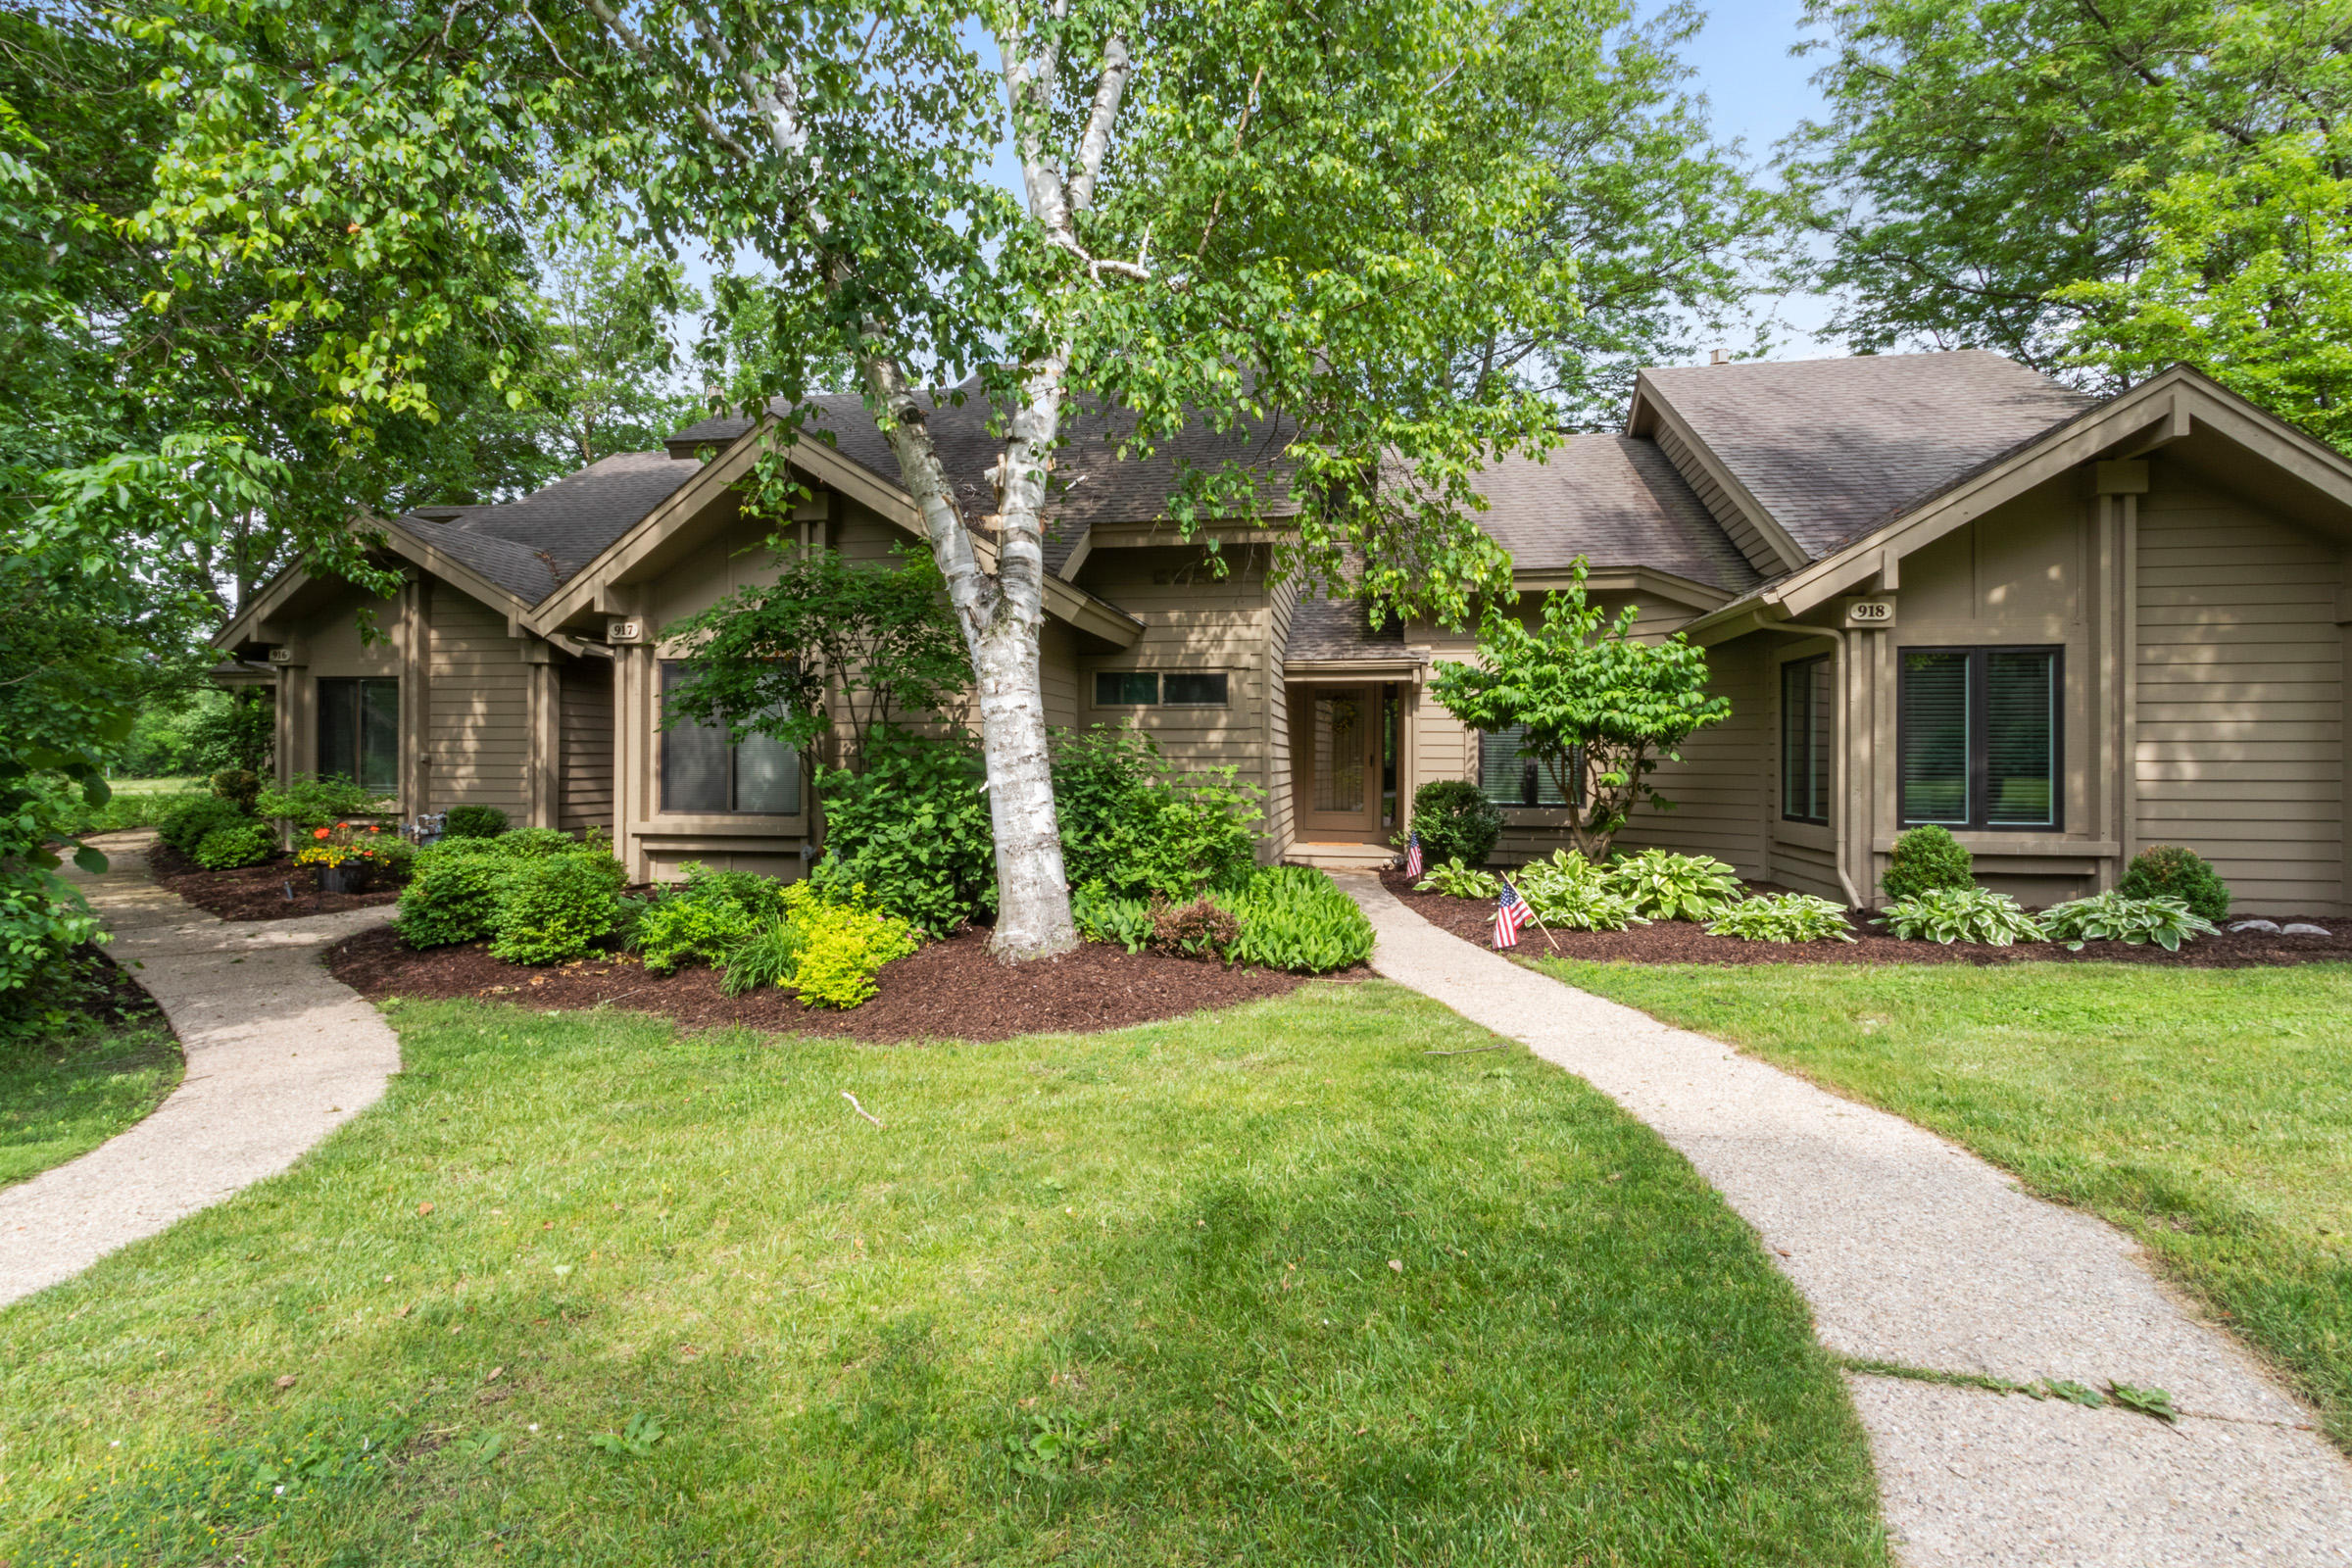 916 Duck Pond Rd, Fontana, Wisconsin 53125, 3 Bedrooms Bedrooms, 5 Rooms Rooms,2 BathroomsBathrooms,Condominiums,For Sale,Duck Pond Rd,1,1676881